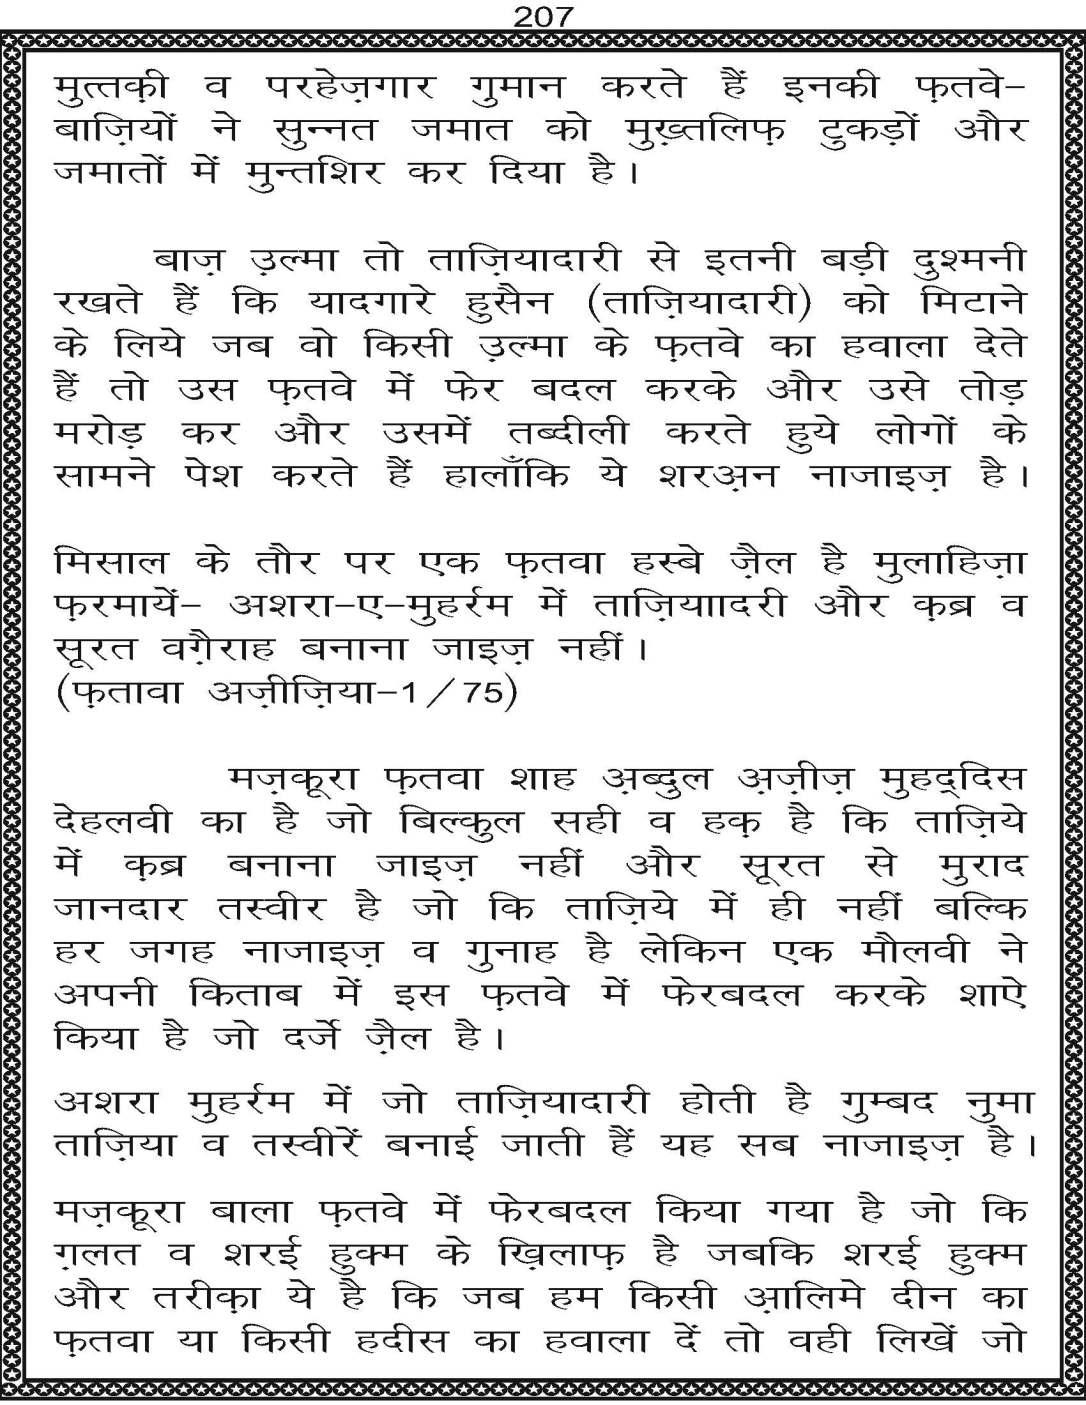 AzmateTaziyadari_Page_207